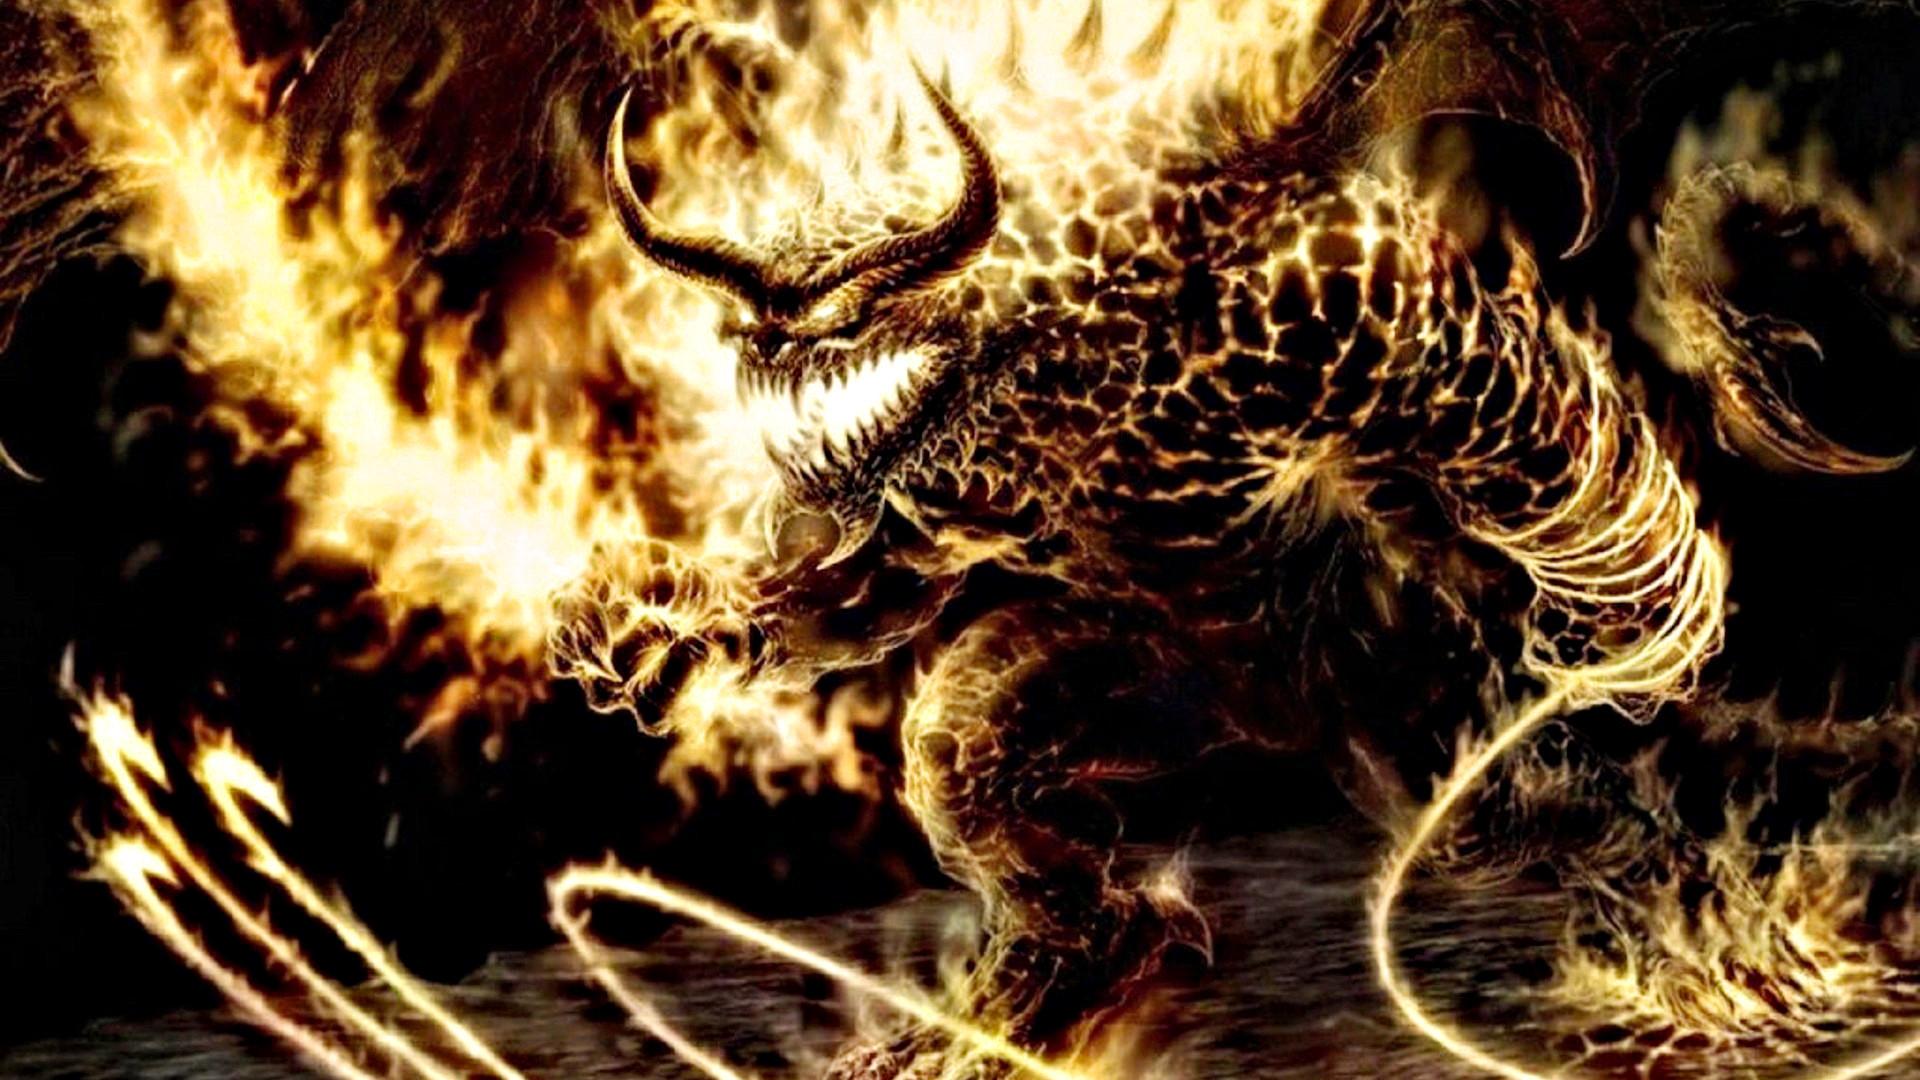 Bull Devil Demon of Hell Wallpaper HD 3219 Wallpaper with .